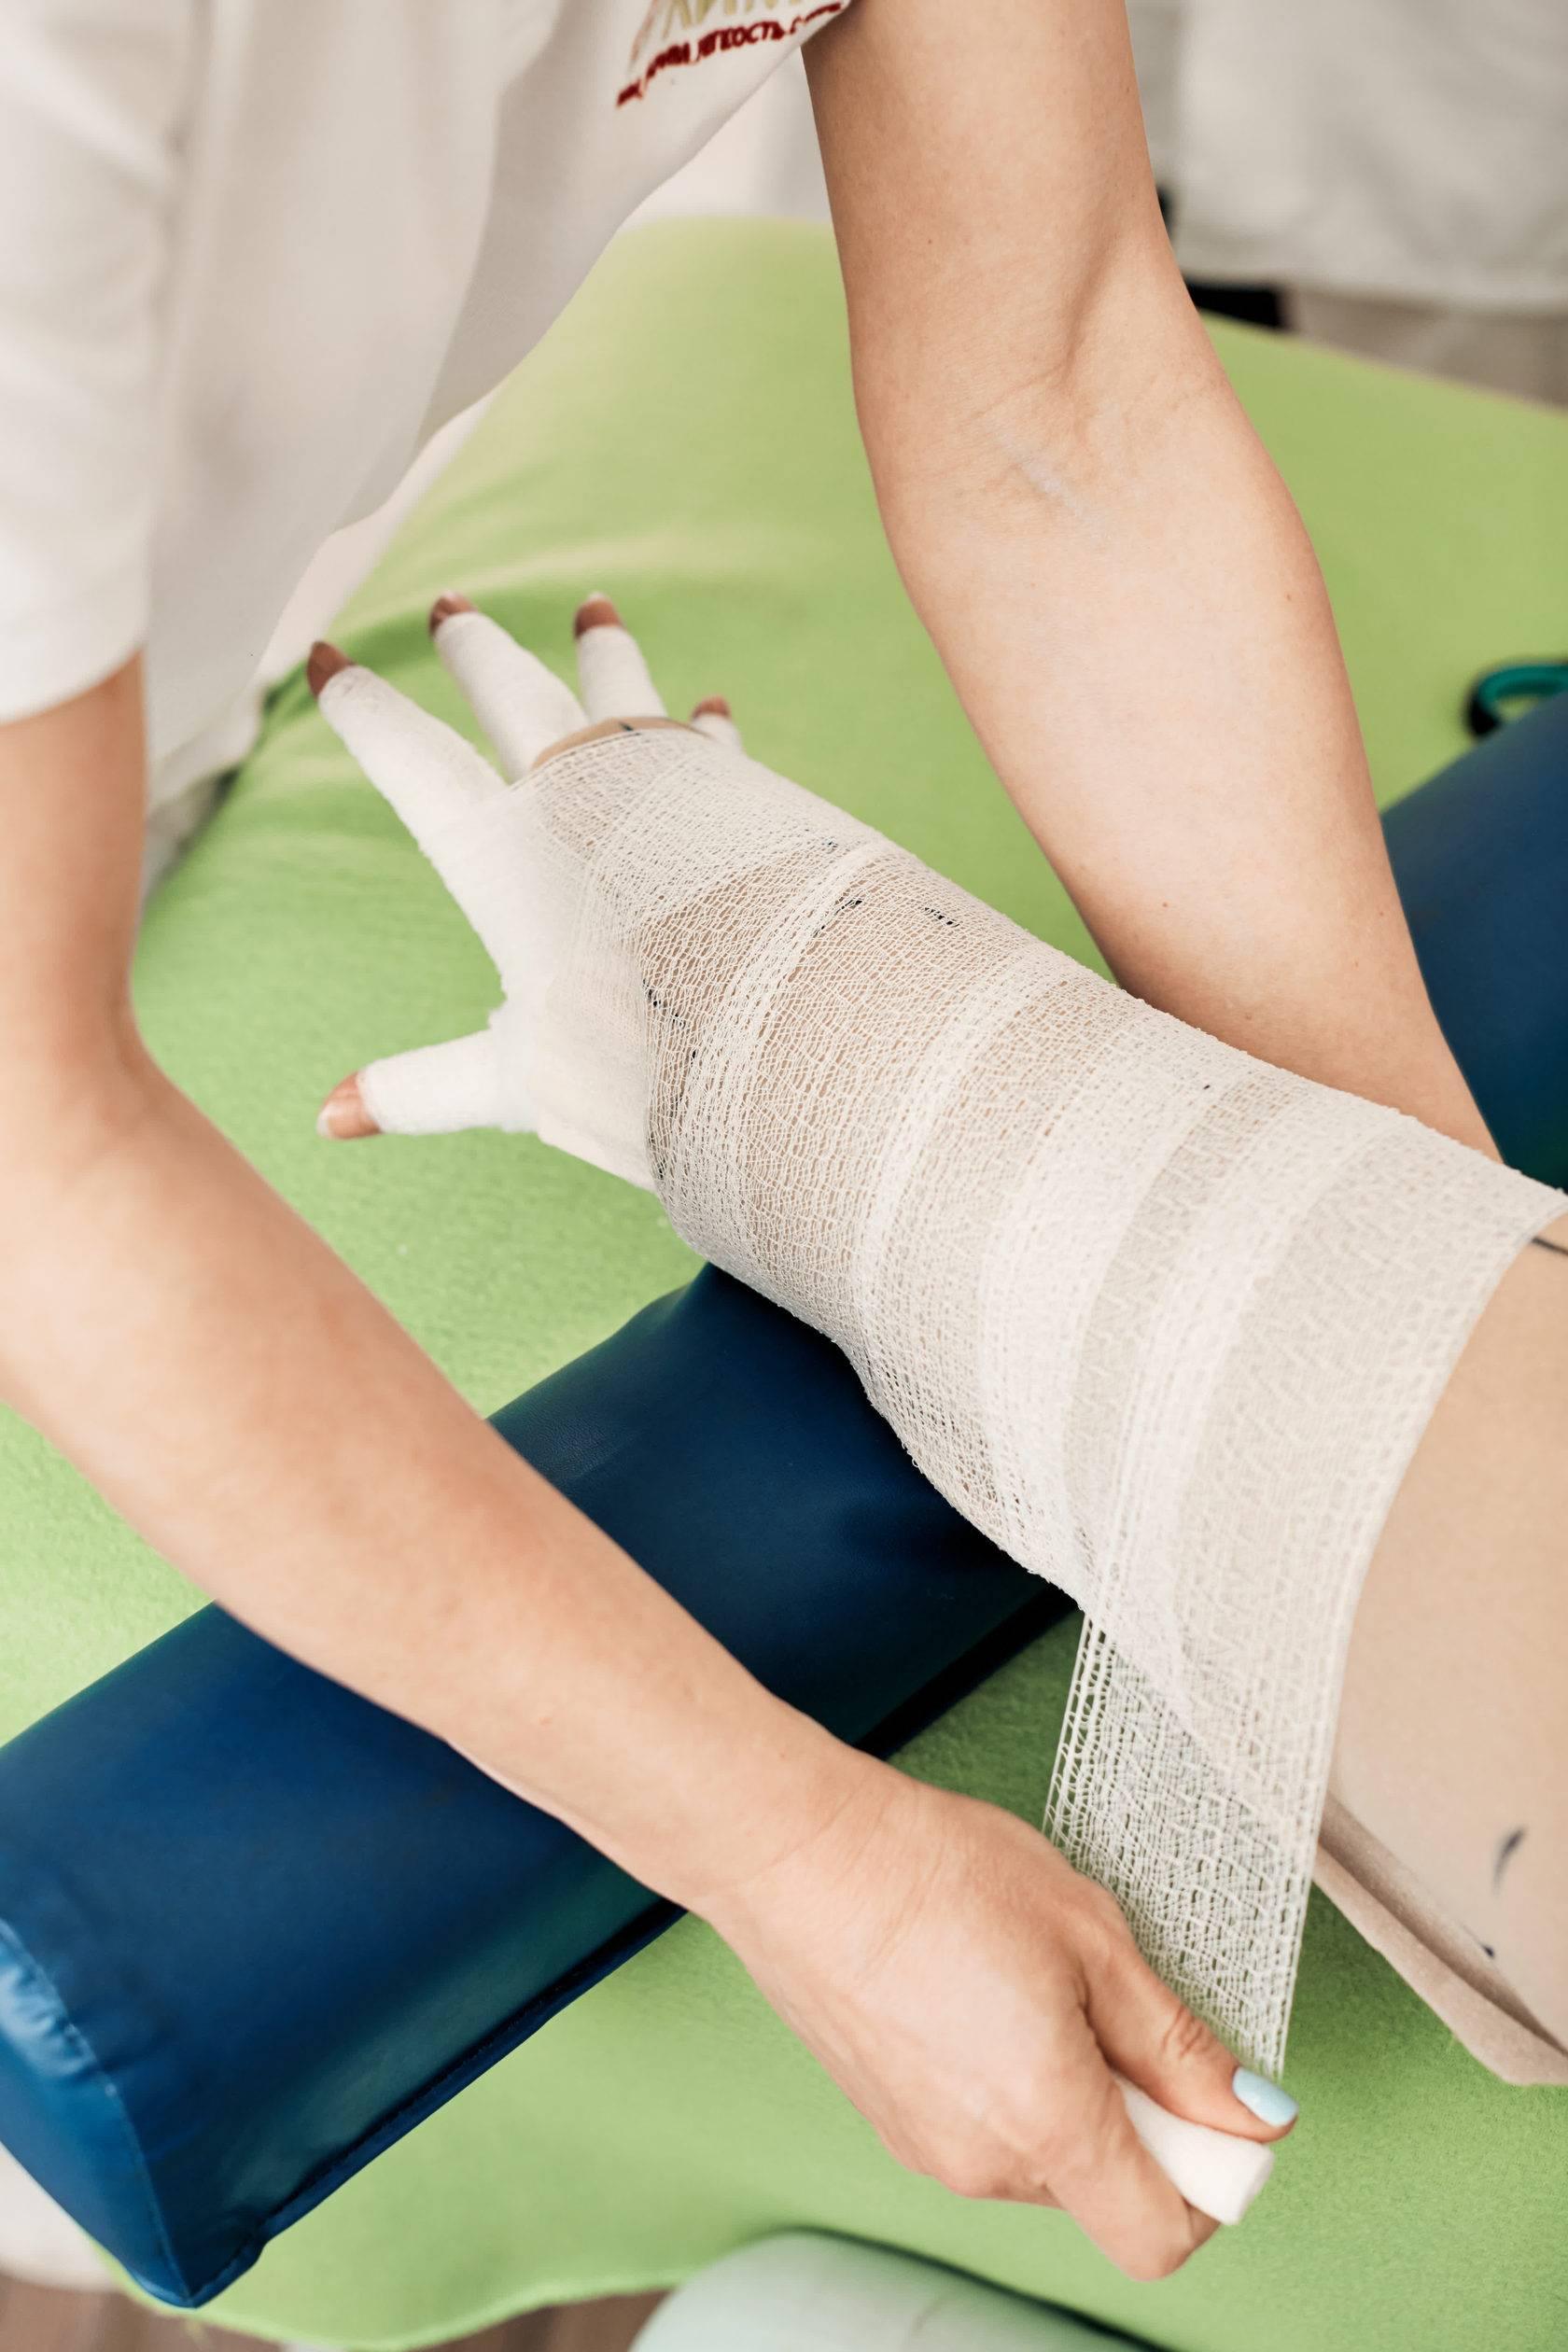 Лечение лимфостаза руки в домашних условиях